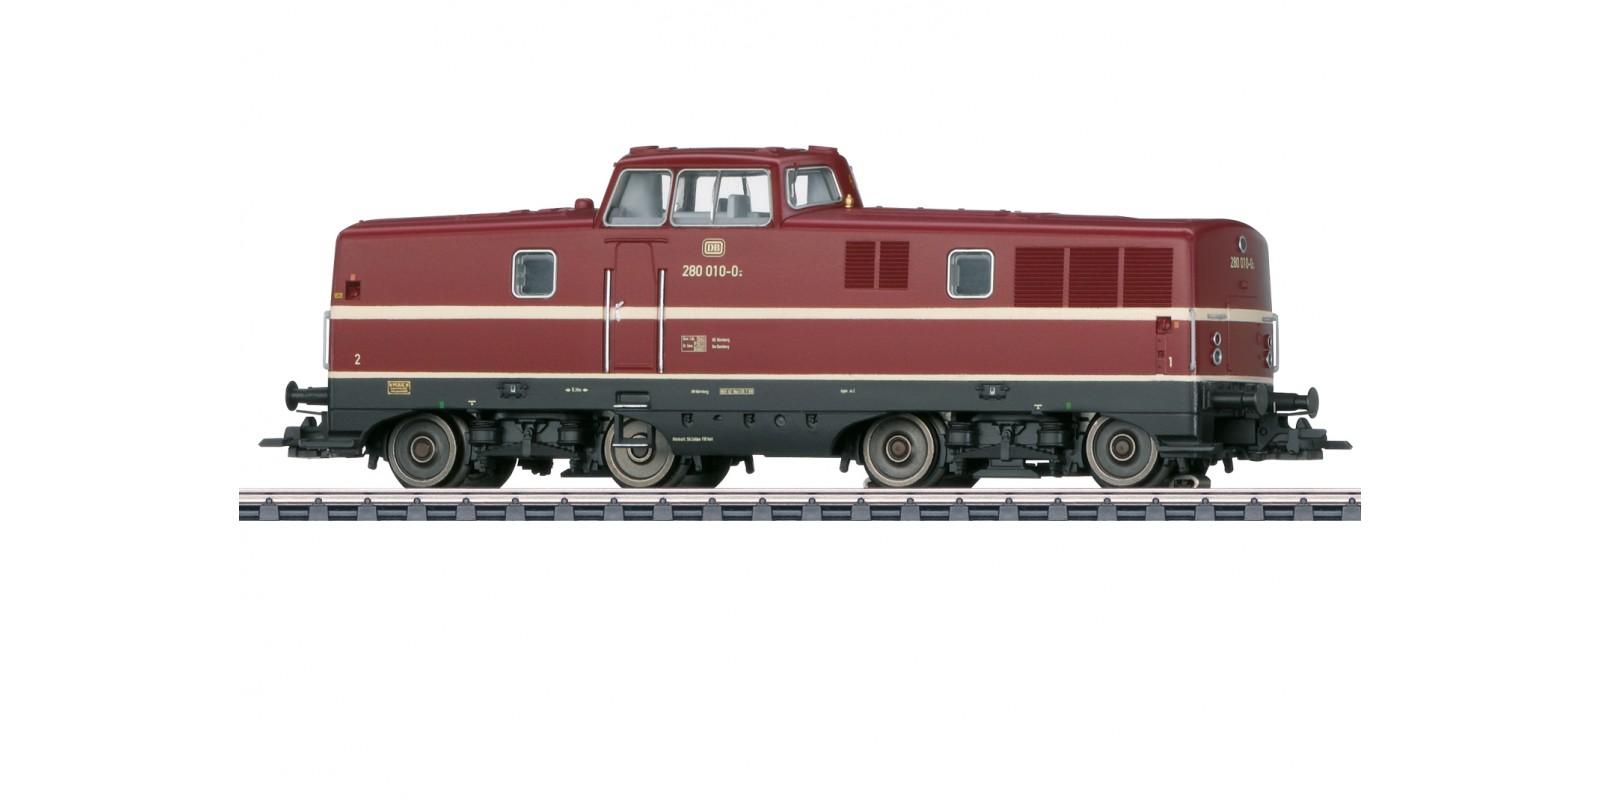 36083 Class 280 Diesel Locomotive